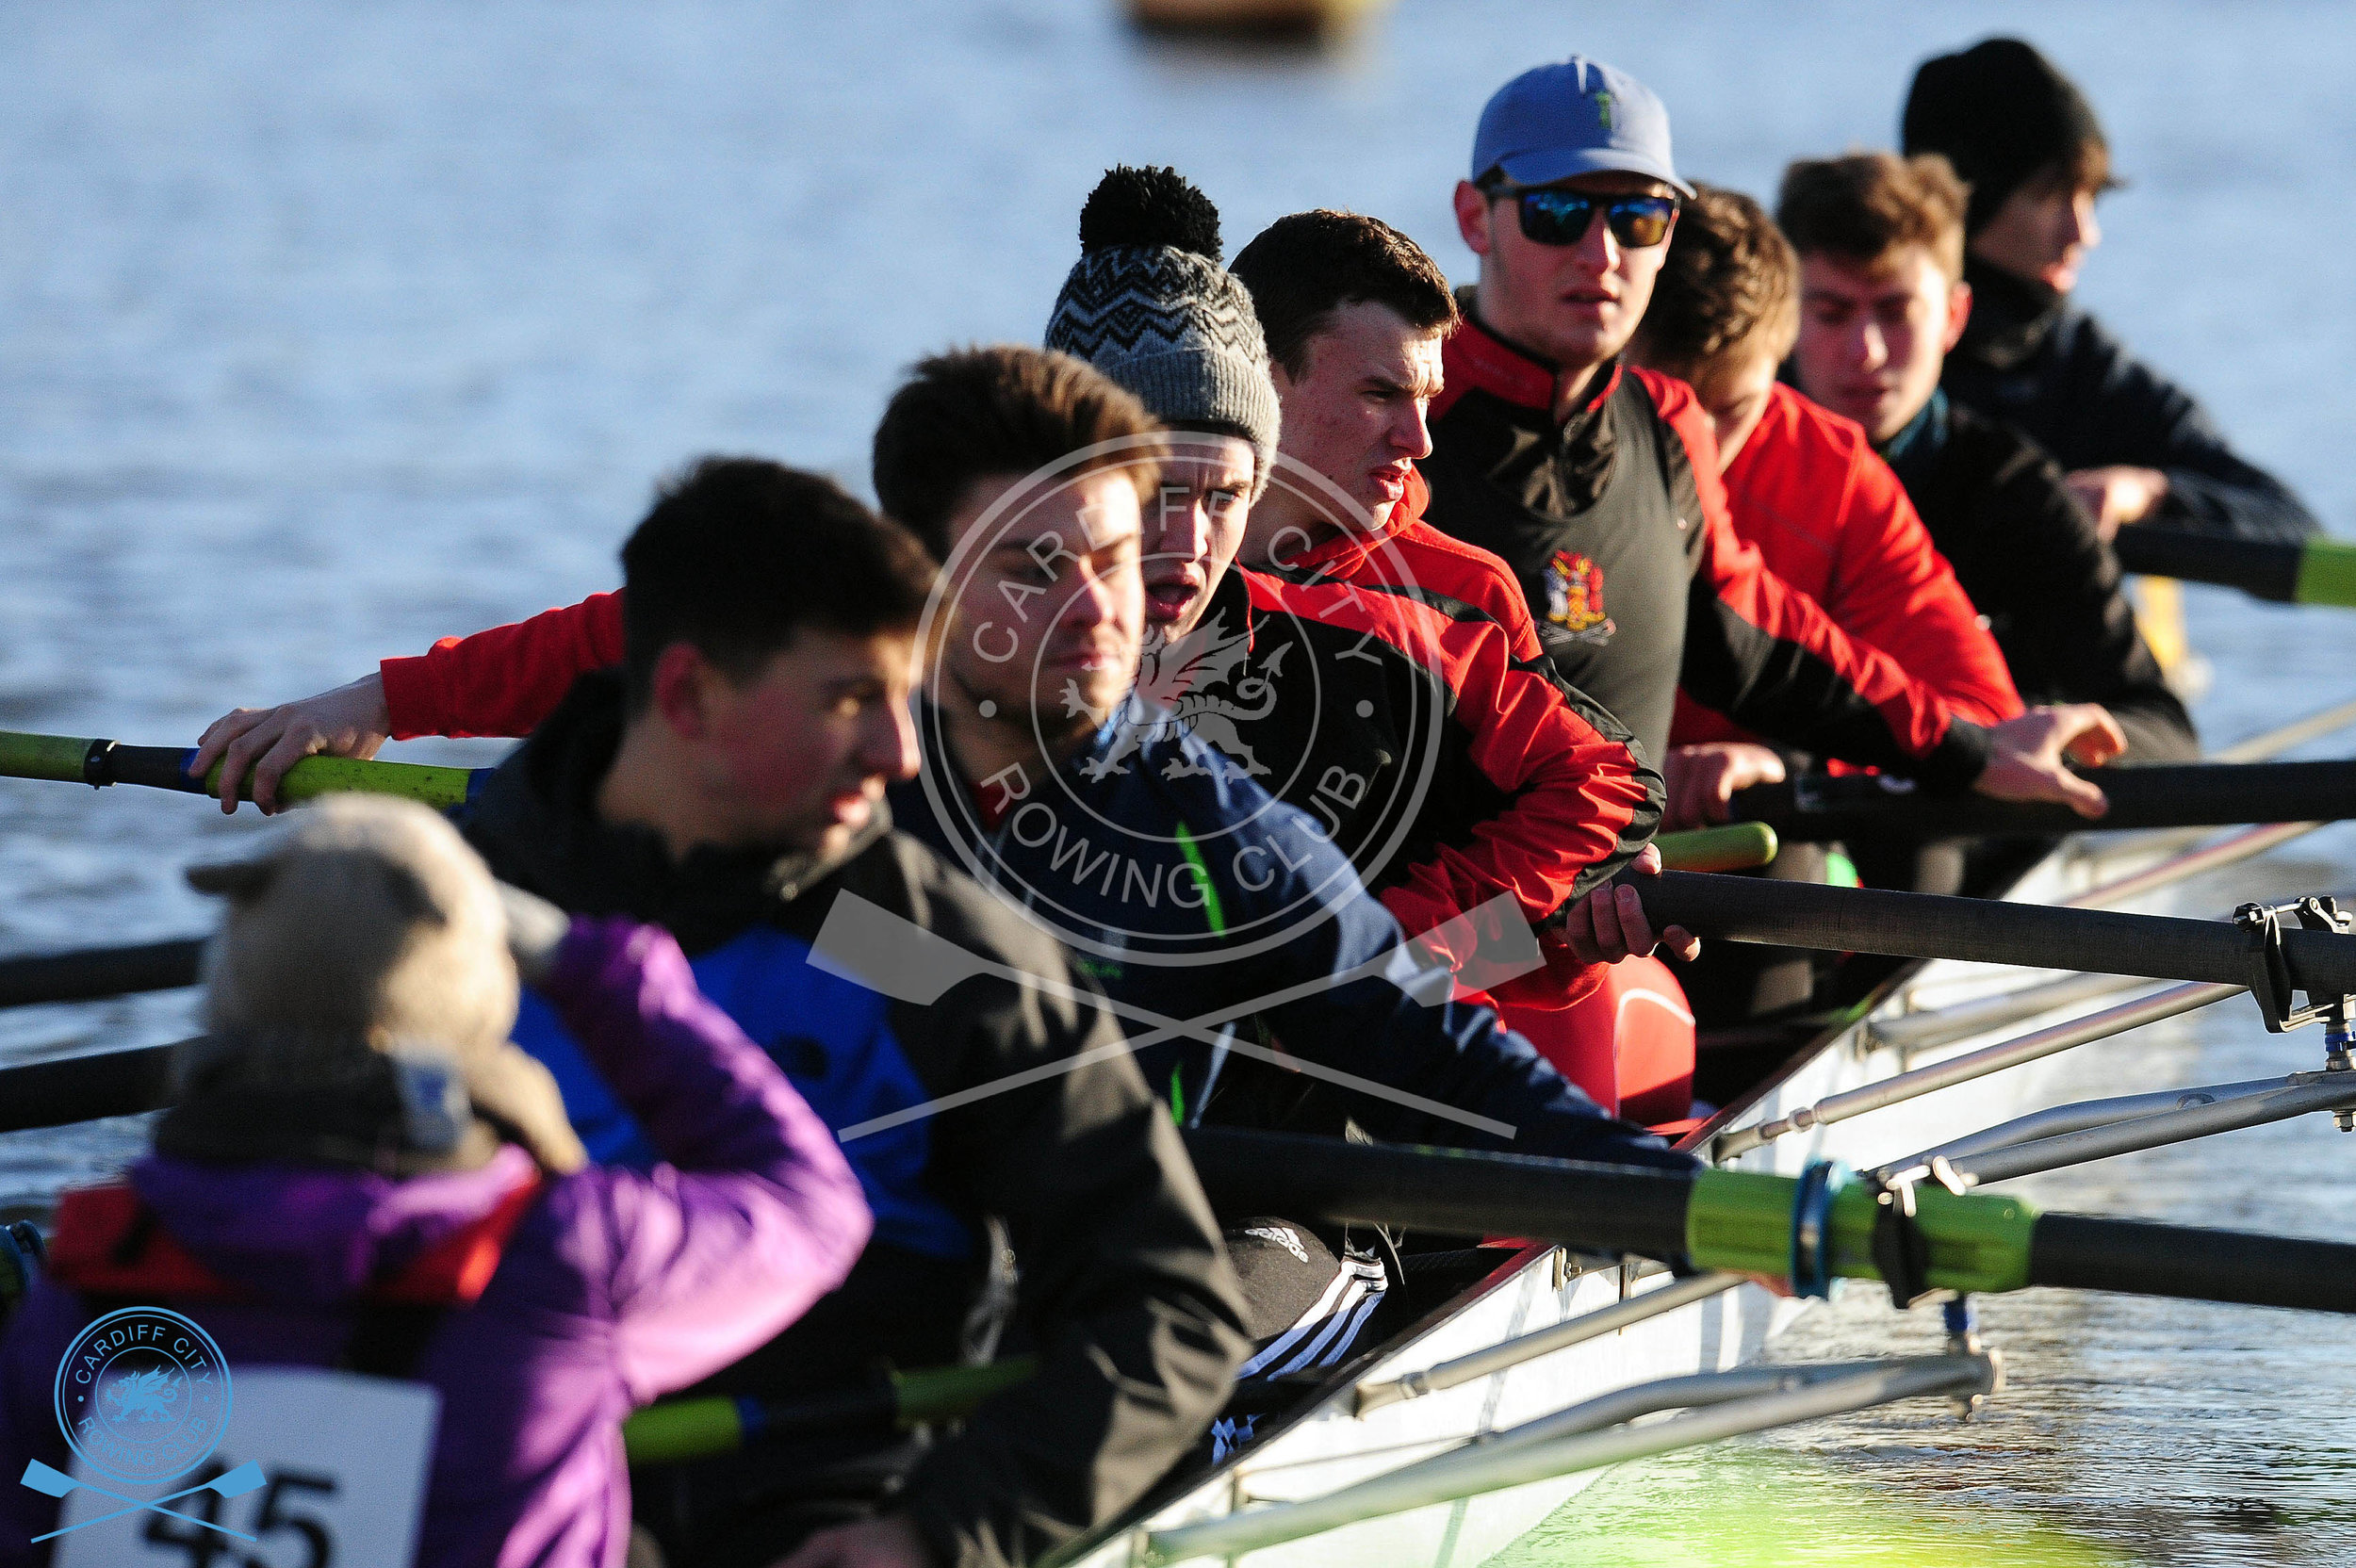 DW_280119_Cardiff_City_Rowing_23.jpg